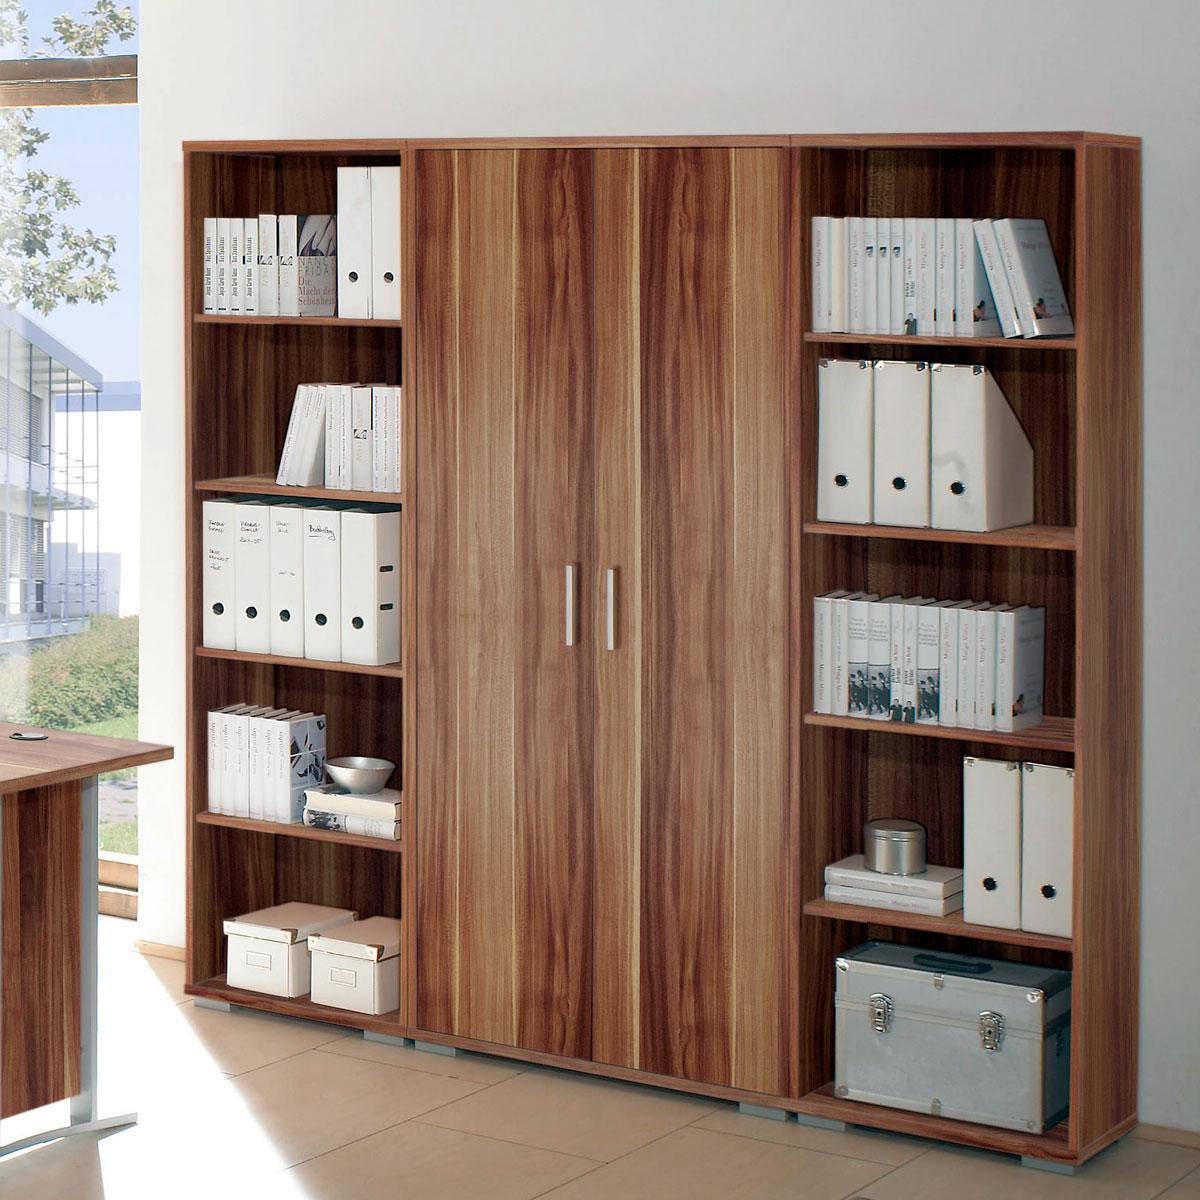 regalwand office line biz regal schrank in walnuss dekor. Black Bedroom Furniture Sets. Home Design Ideas